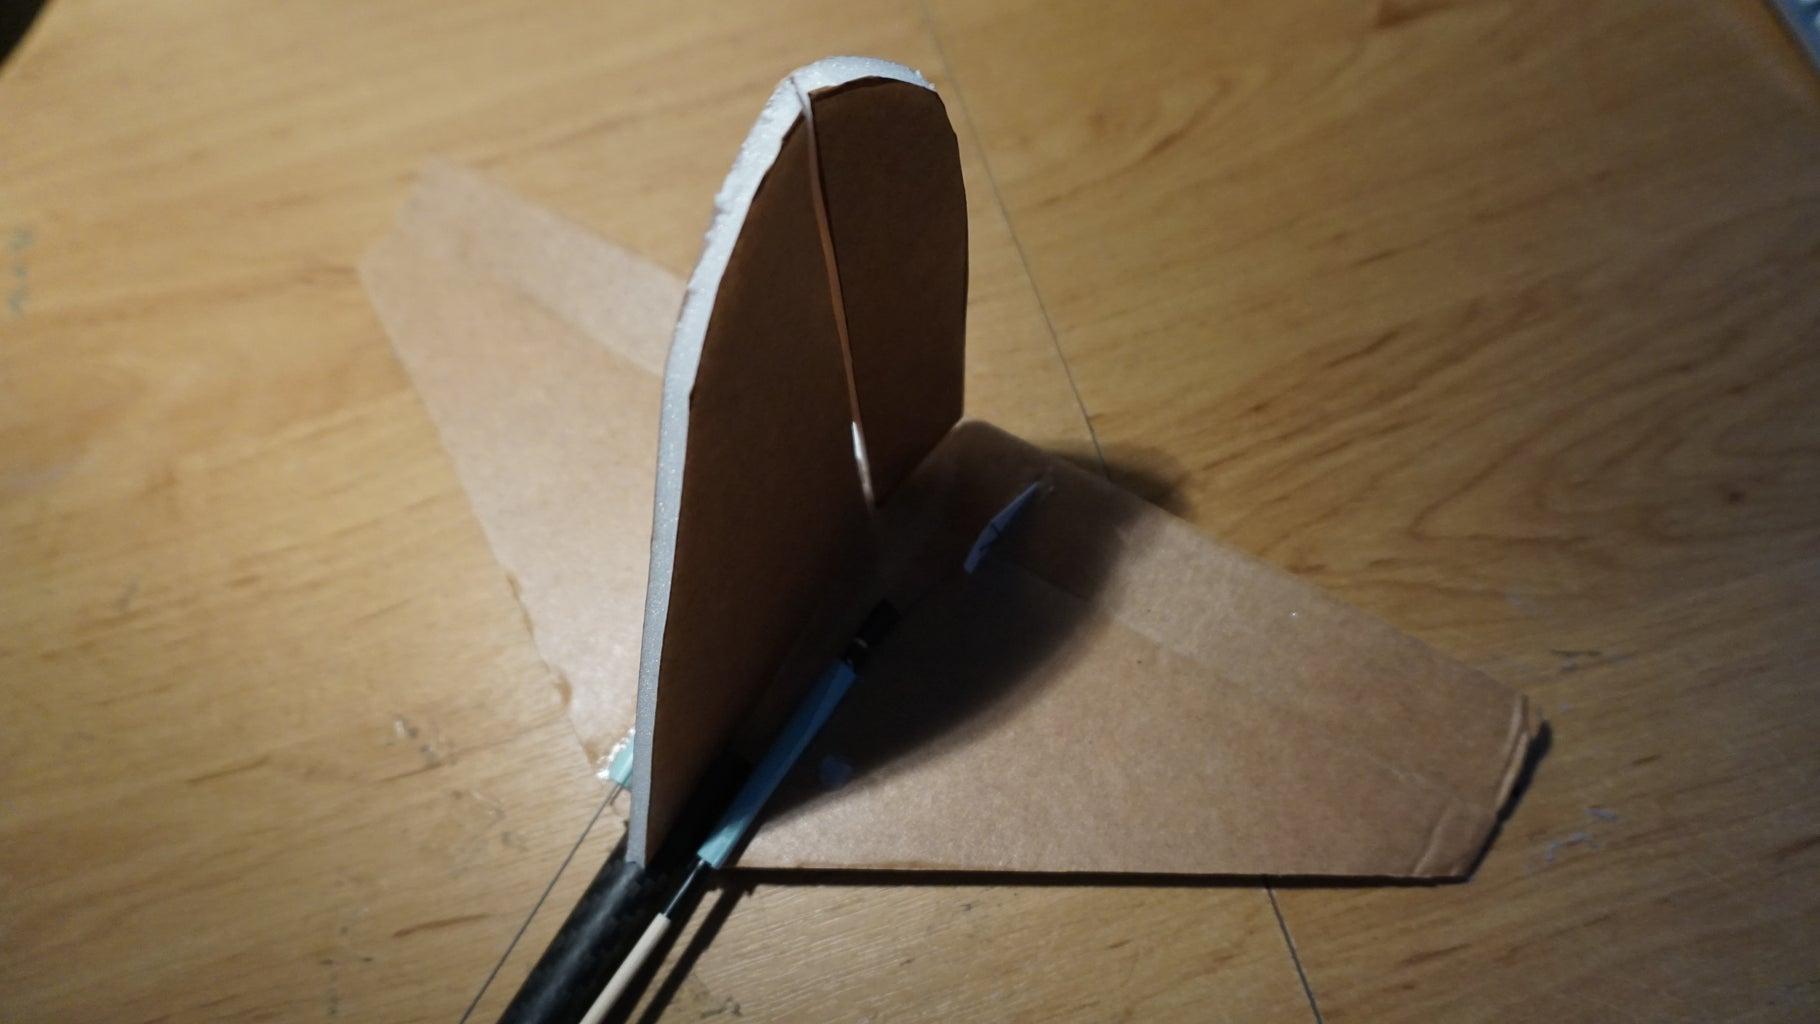 Step 4: Cut Tail